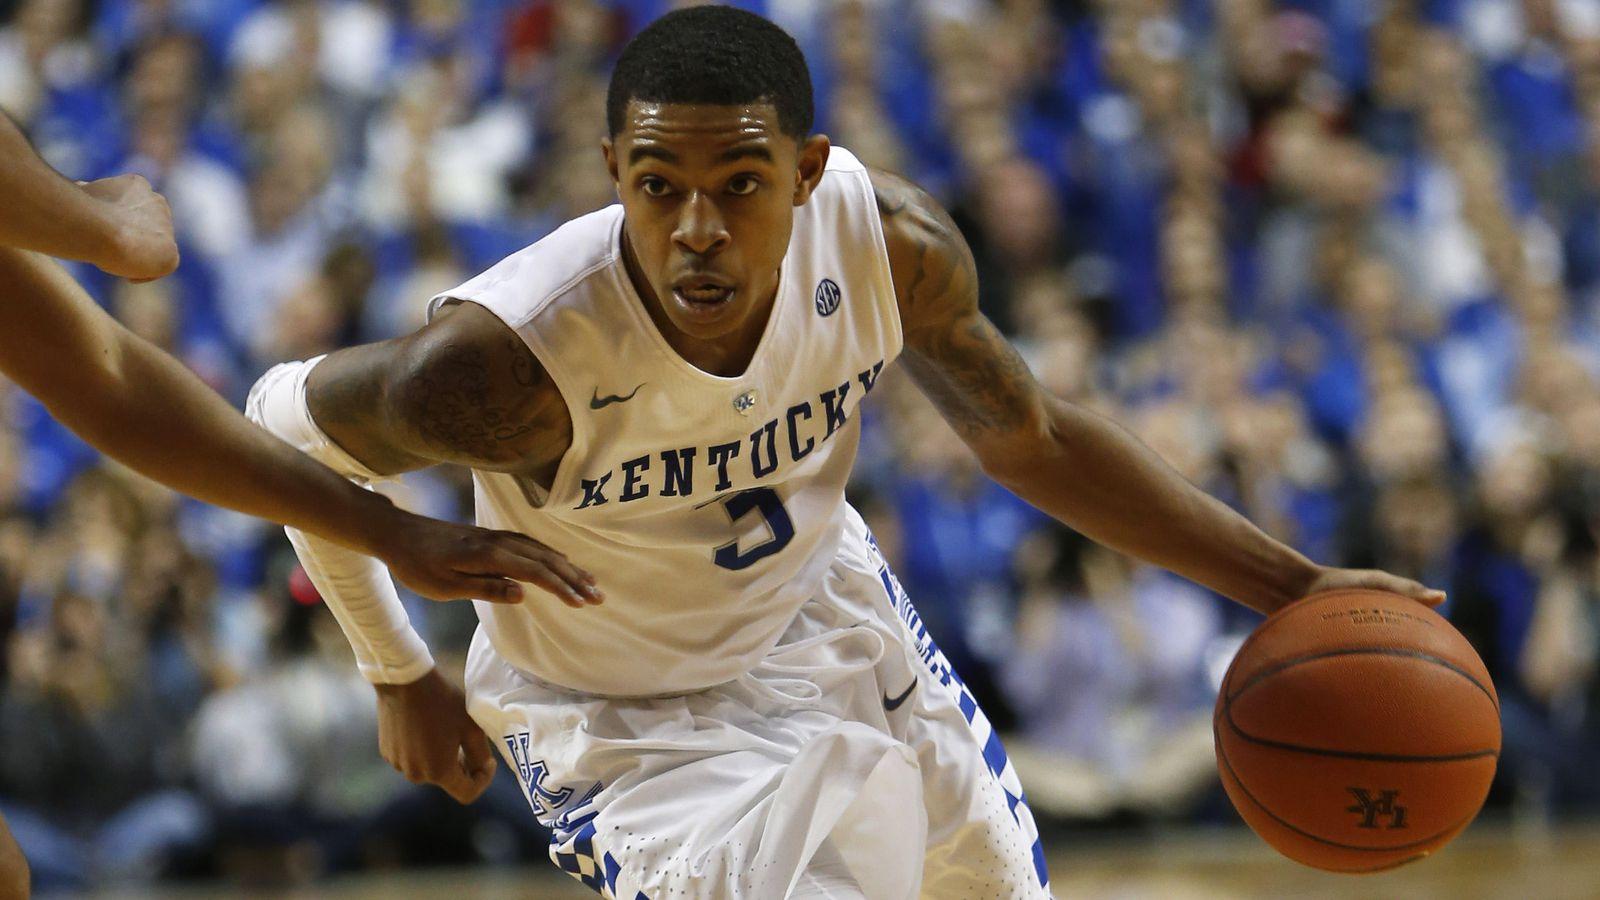 Kentucky Basketball Uk Has Second Best Odds To Win: Cardinal-Killer Tyler Ulis Named MVP Of Kentucky Wildcats